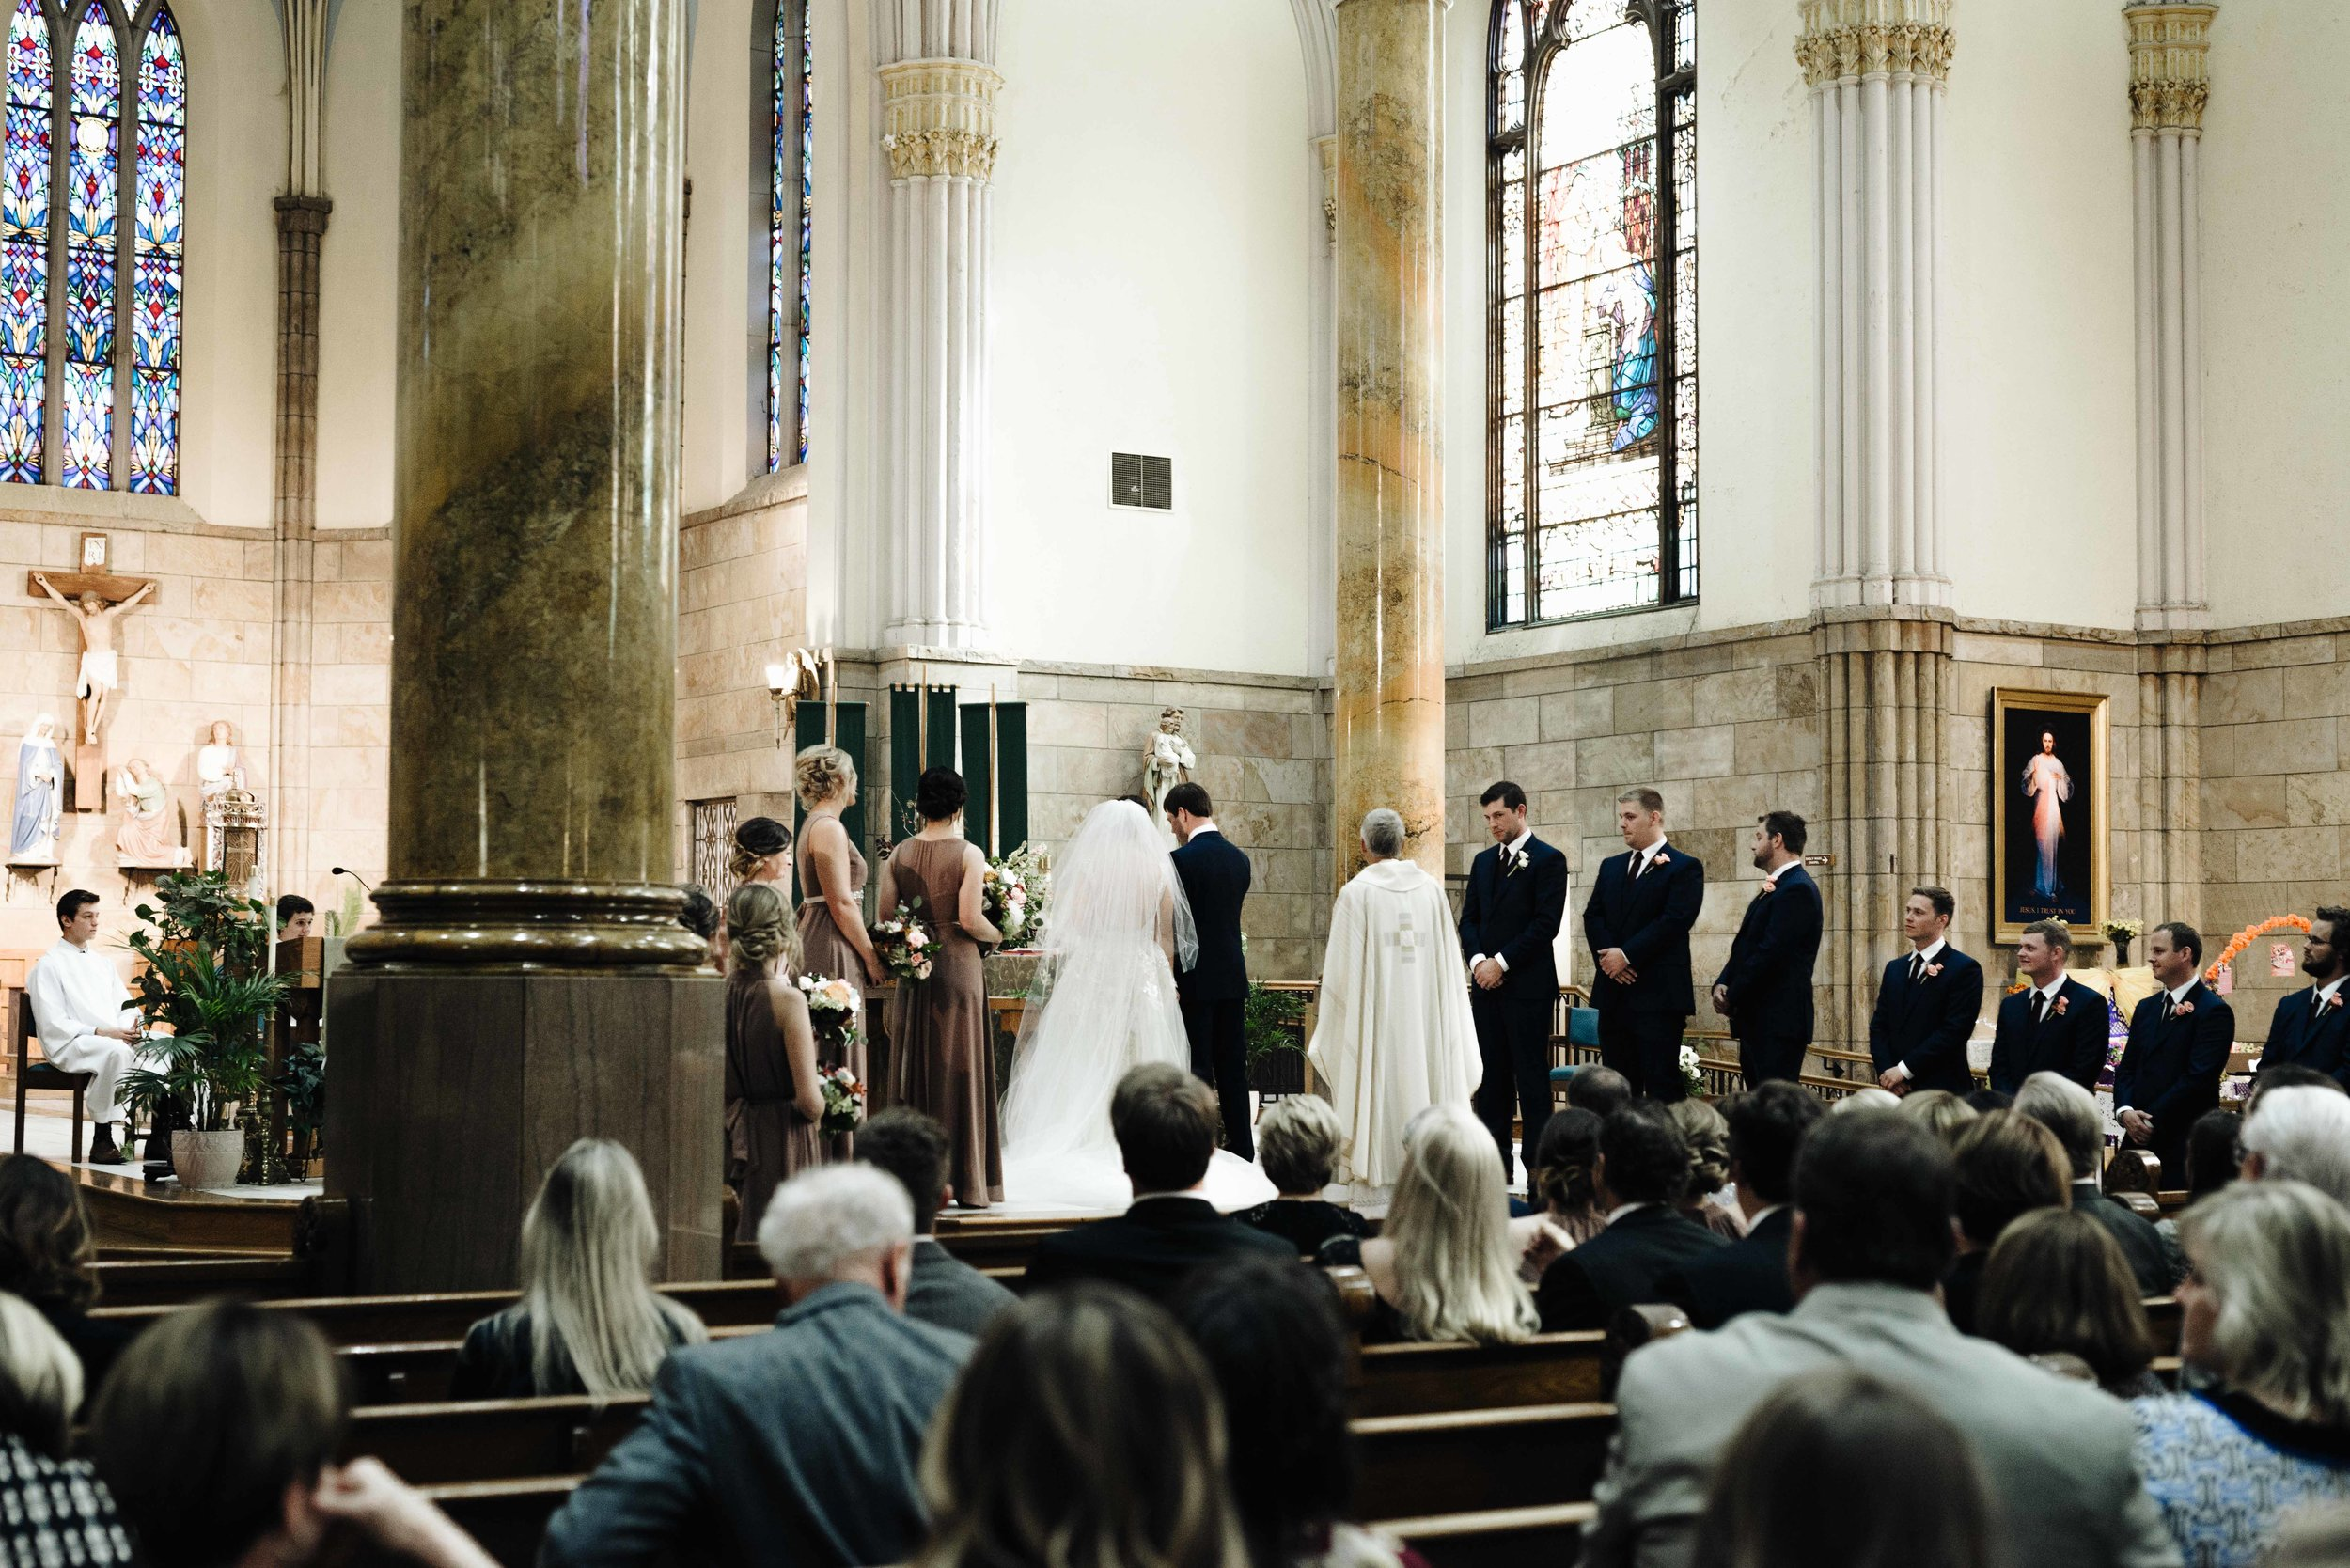 Carlee-Bob-Indianapolis-Wedding-Blog-53.jpg